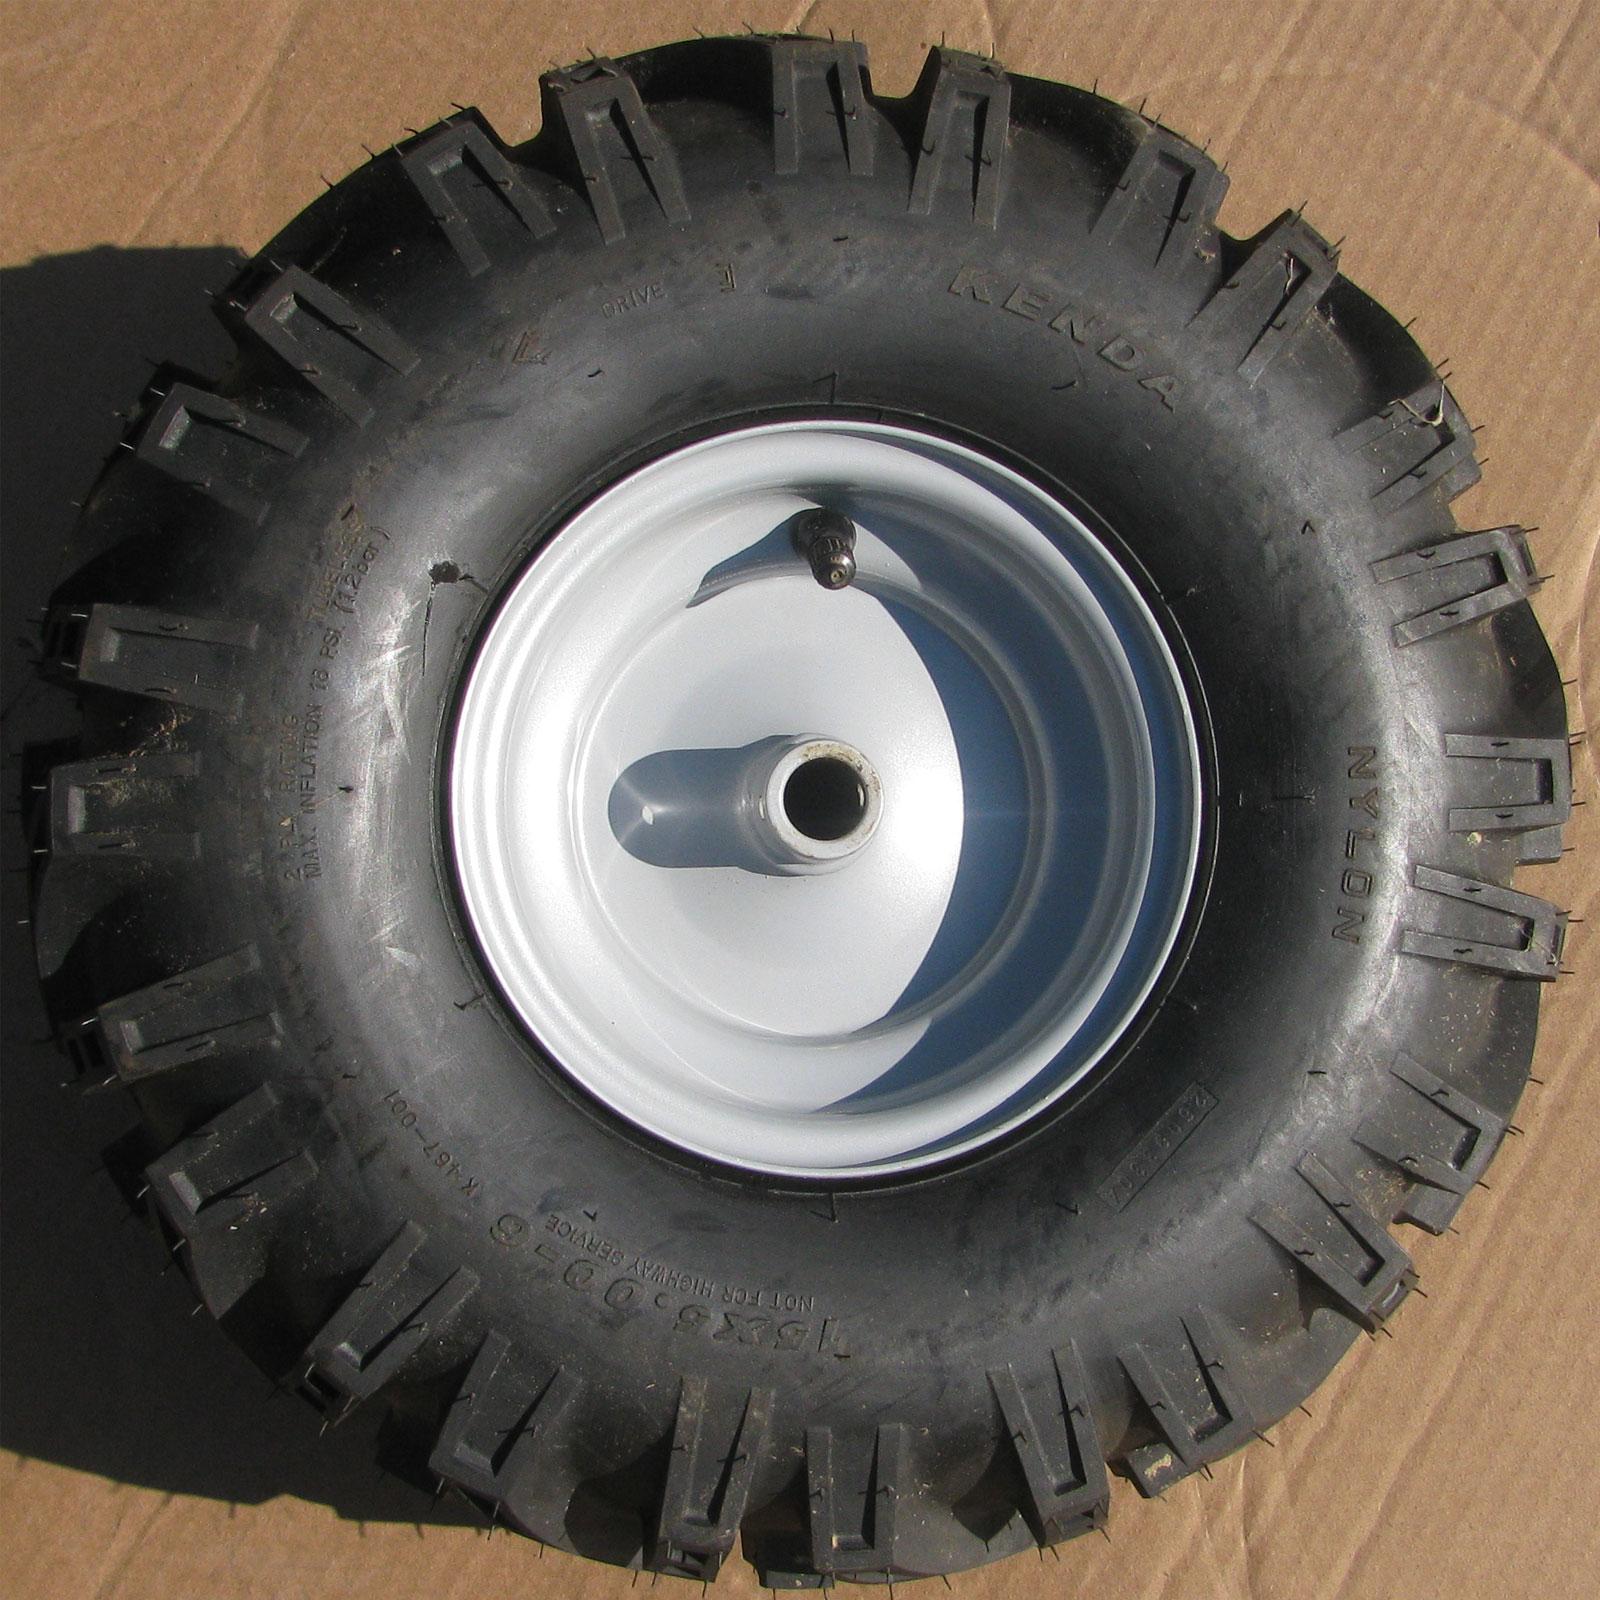 1 15x5 00 6 15 500 6 Snow Blower Thrower Tiller Tire Rim Wheel Assembly Right